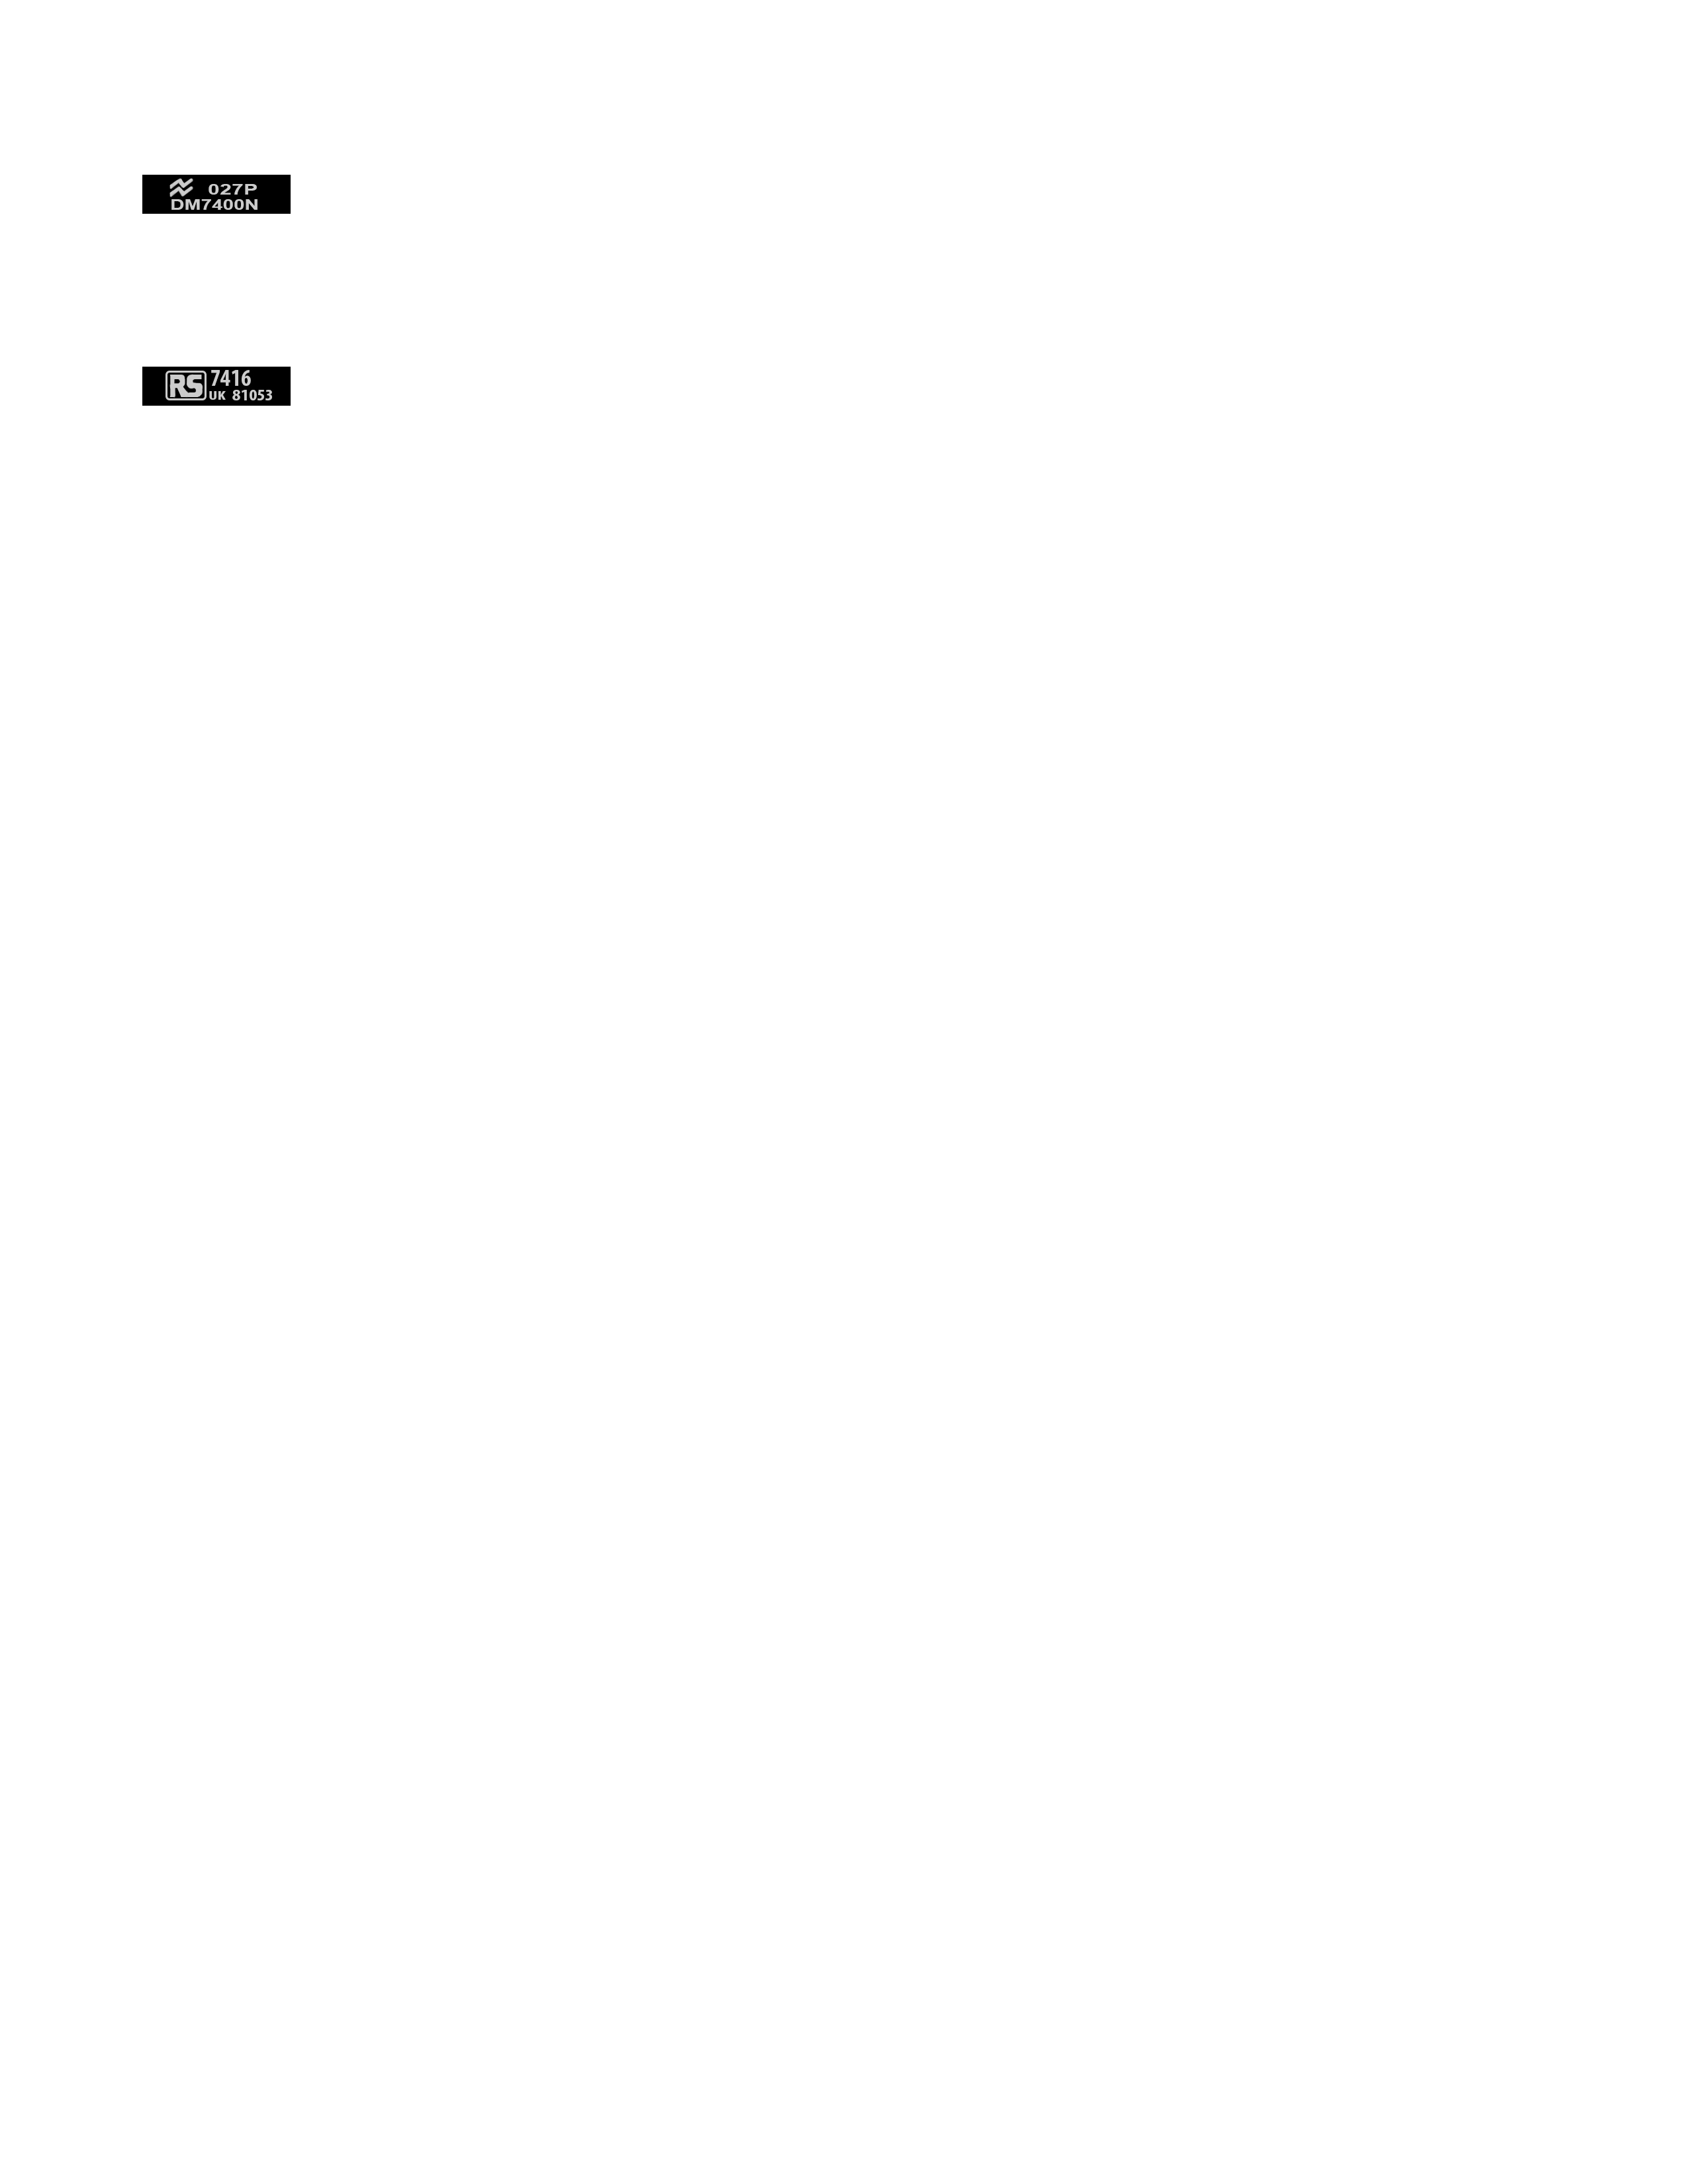 8x10 LABELS.jpg